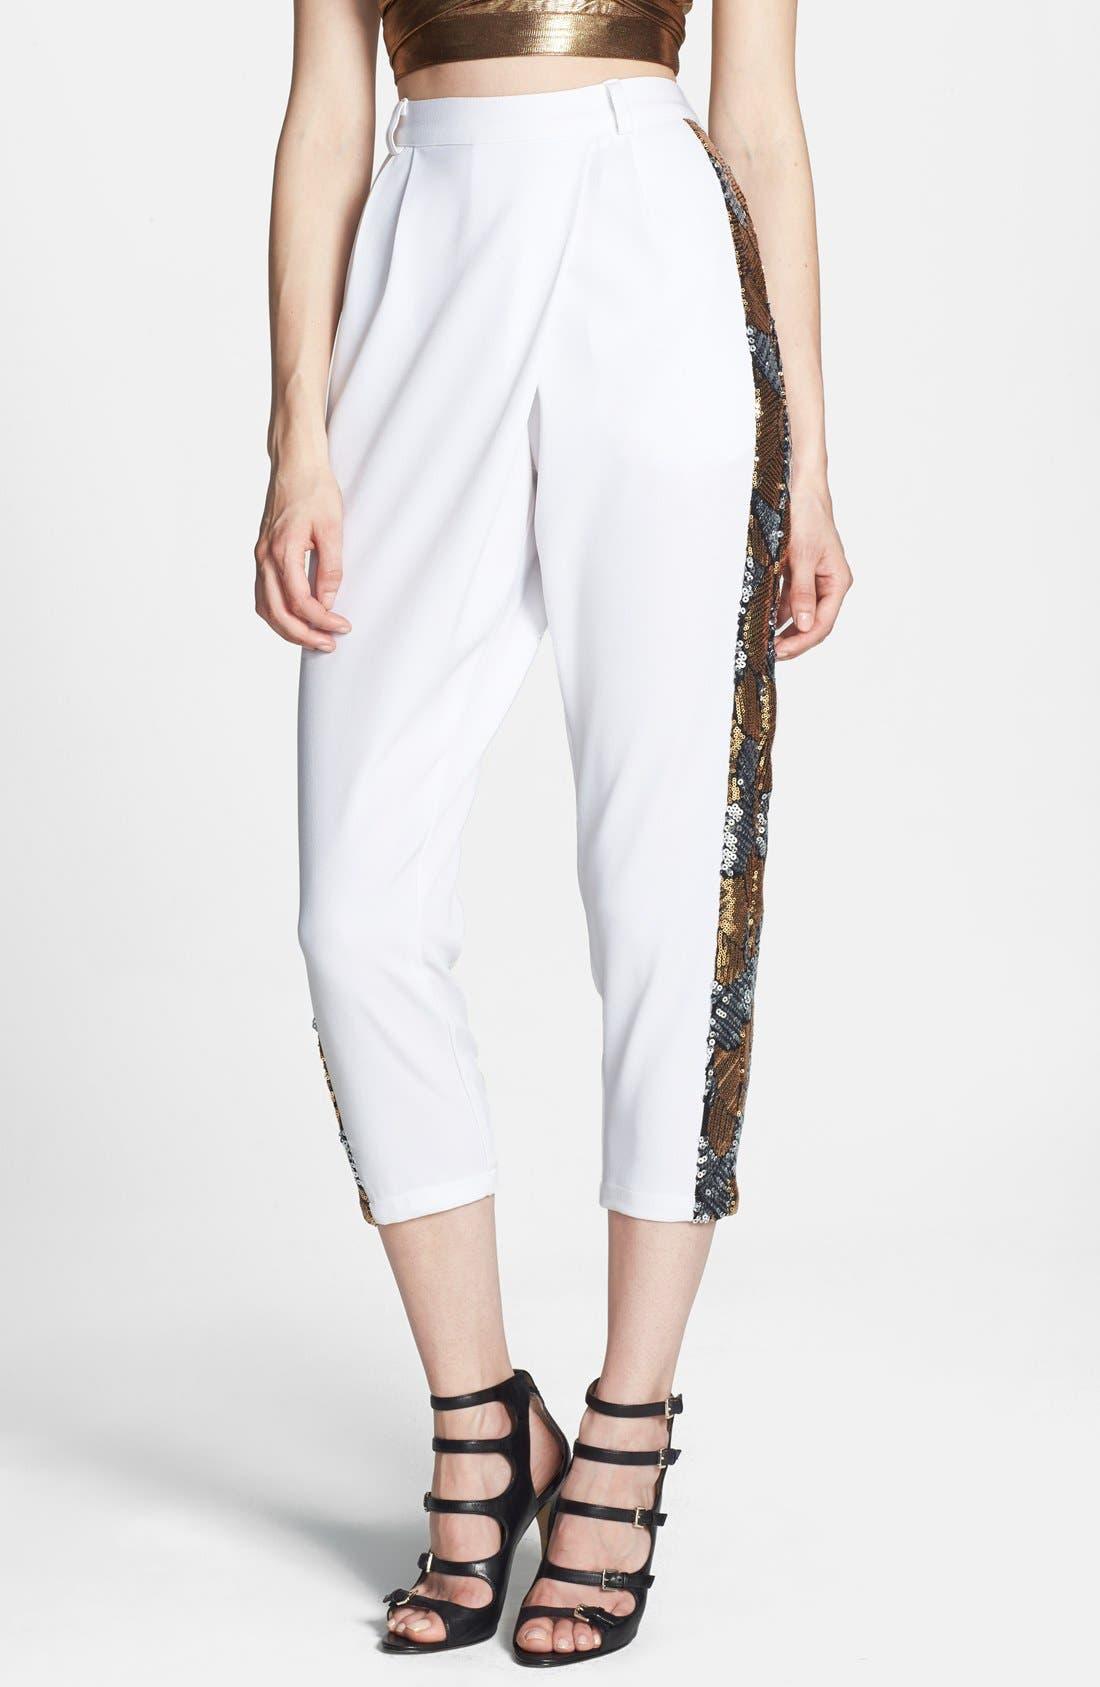 Alternate Image 1 Selected - Rules of Etiquette Sequin Tuxedo Stripe Crop Pants